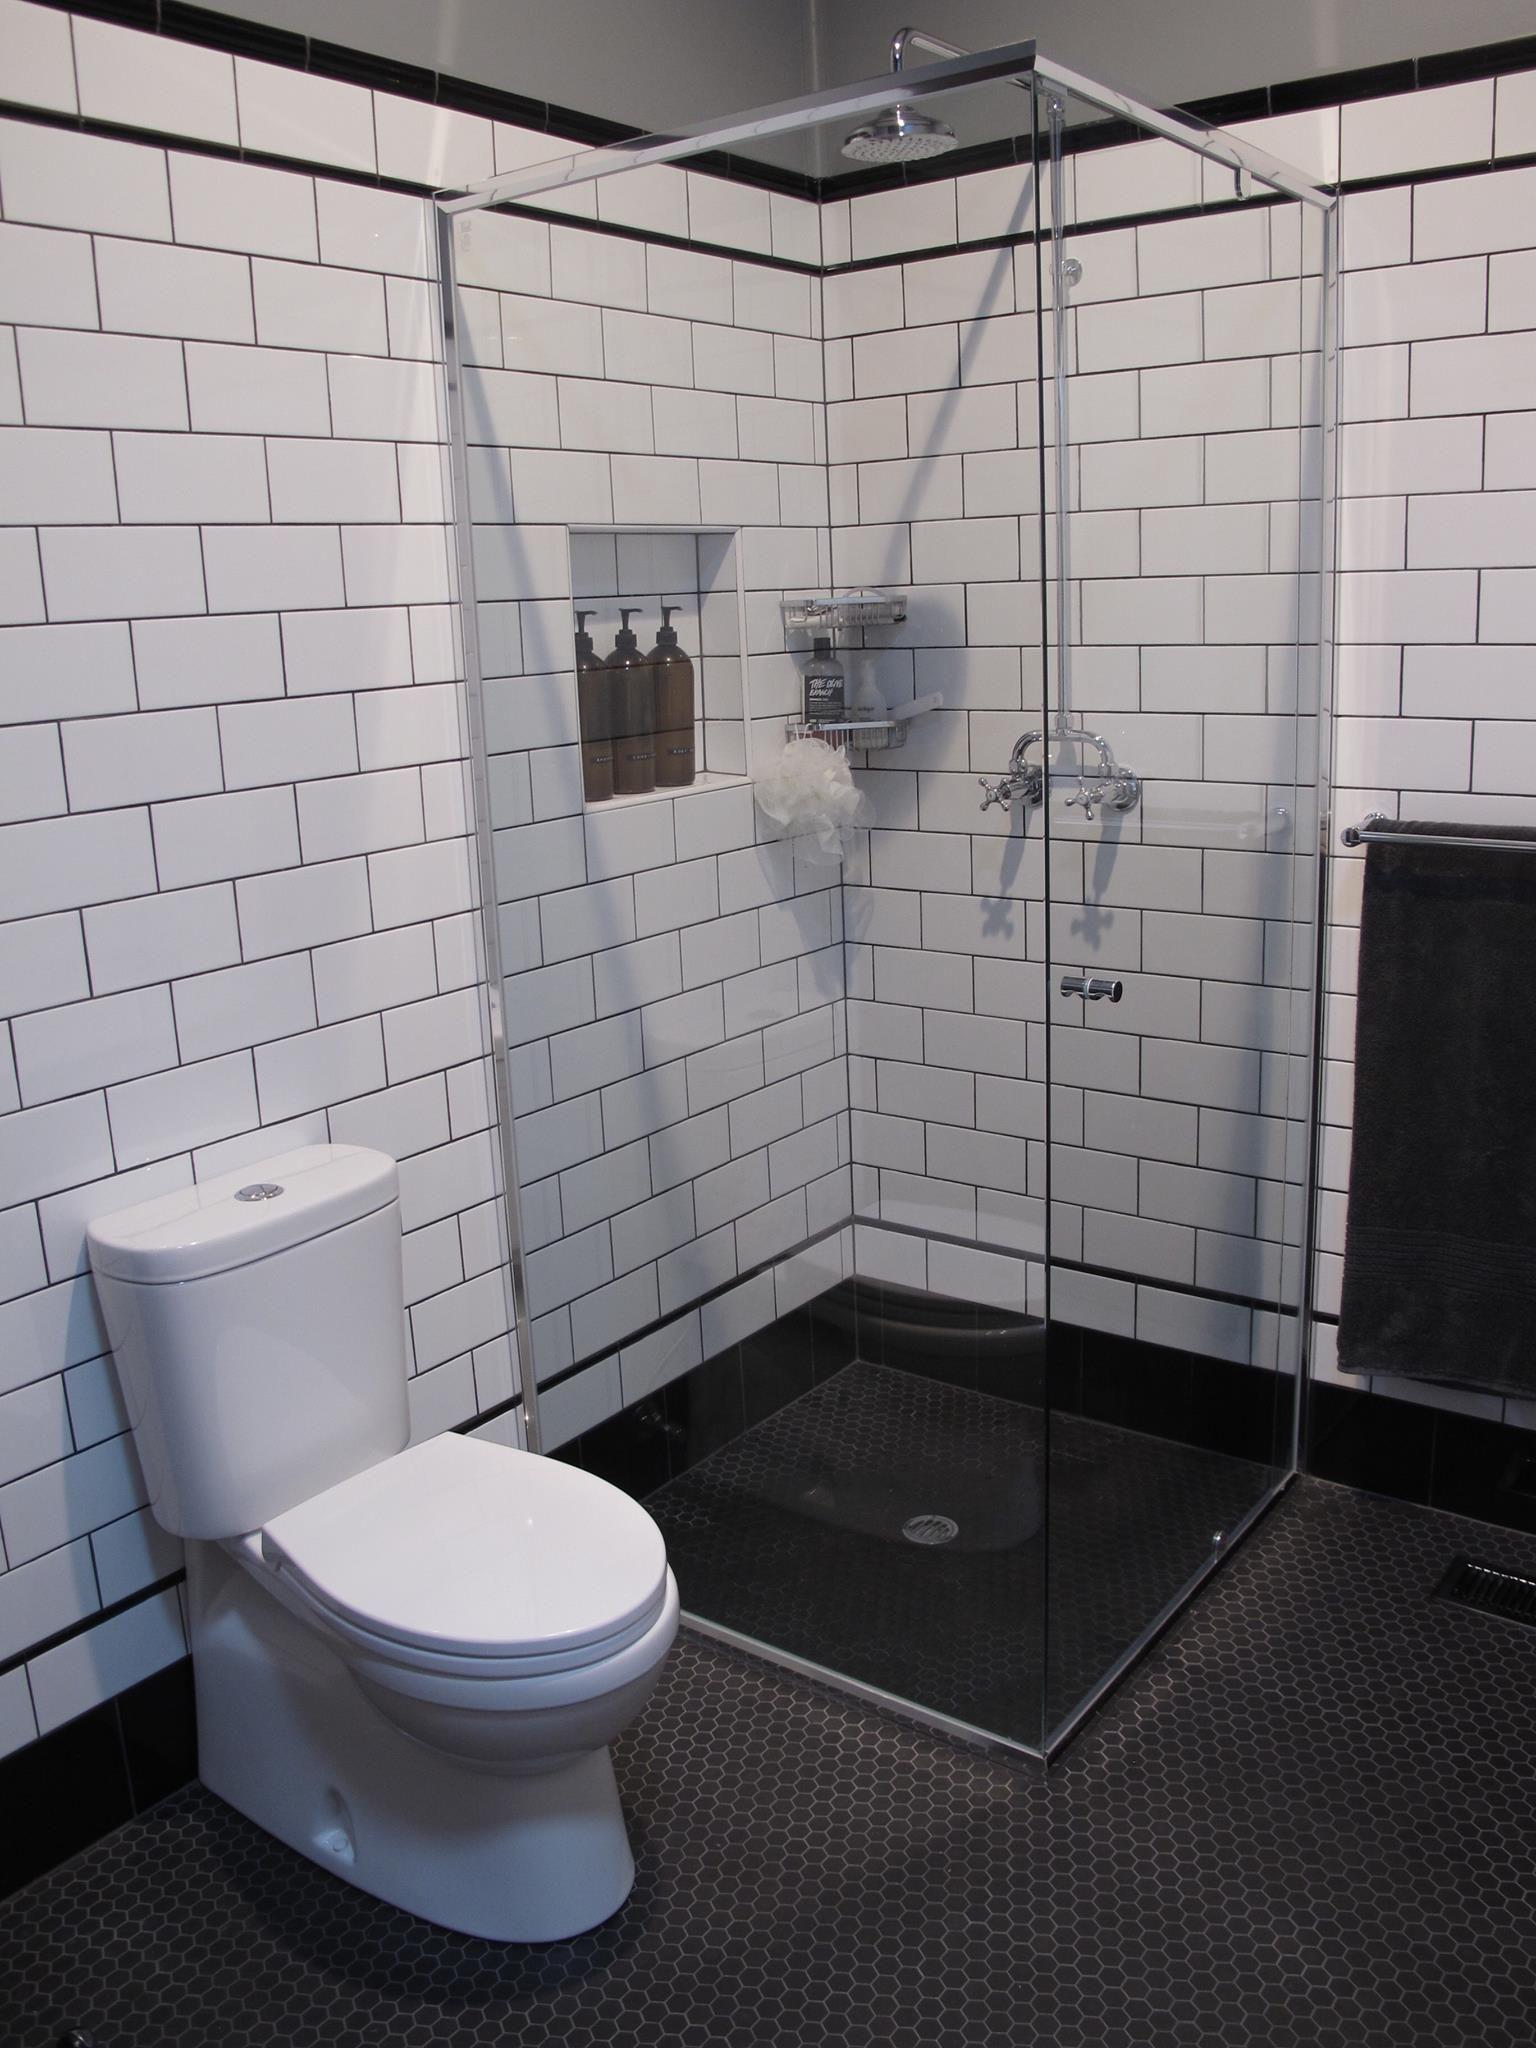 Bathroom Renovation No2 Black And White Subway Tiles Hexagonal